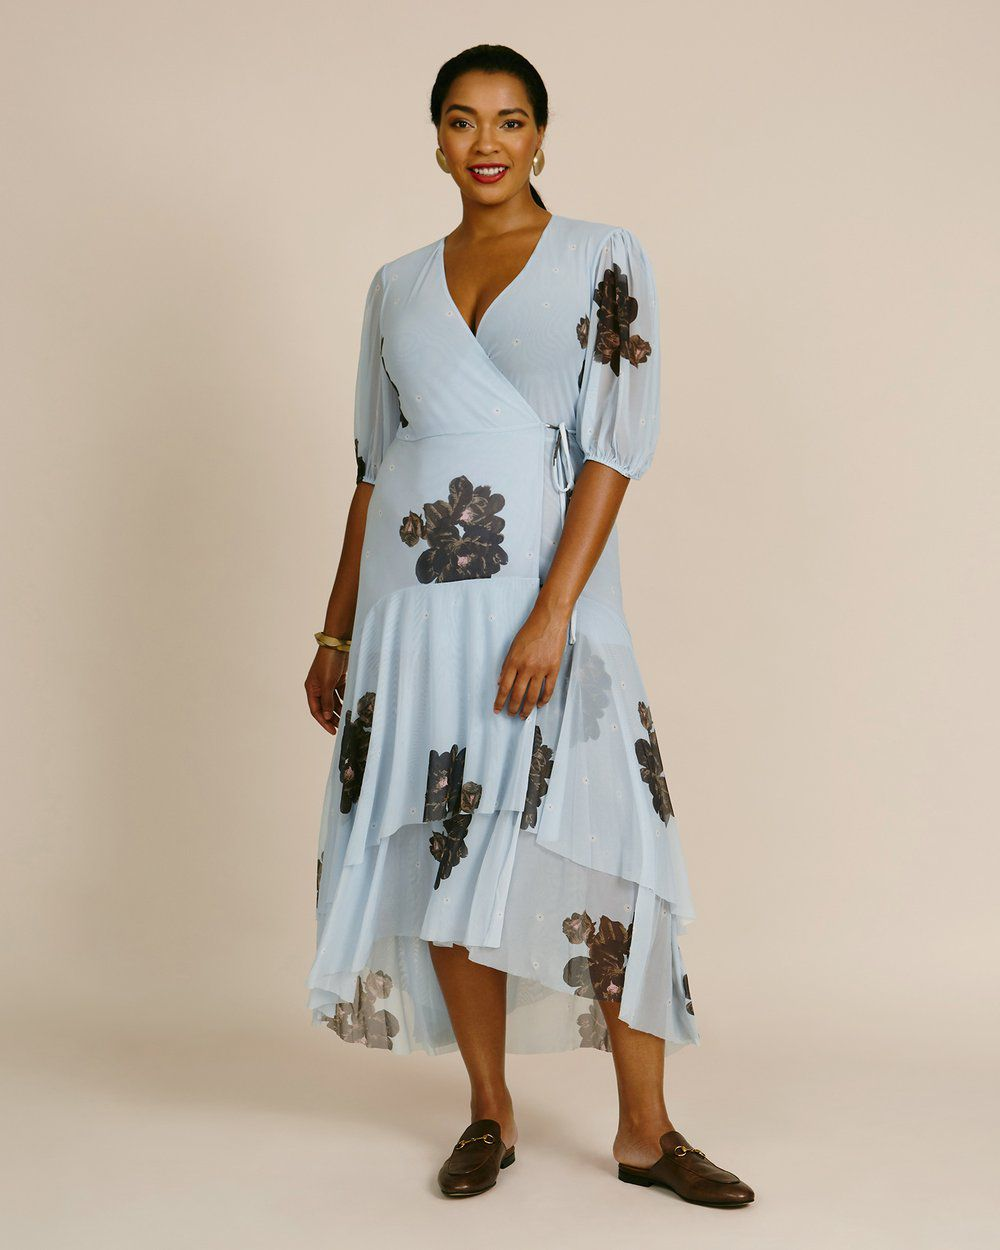 Ganni Printed Mesh Dress, $345, on sale $242